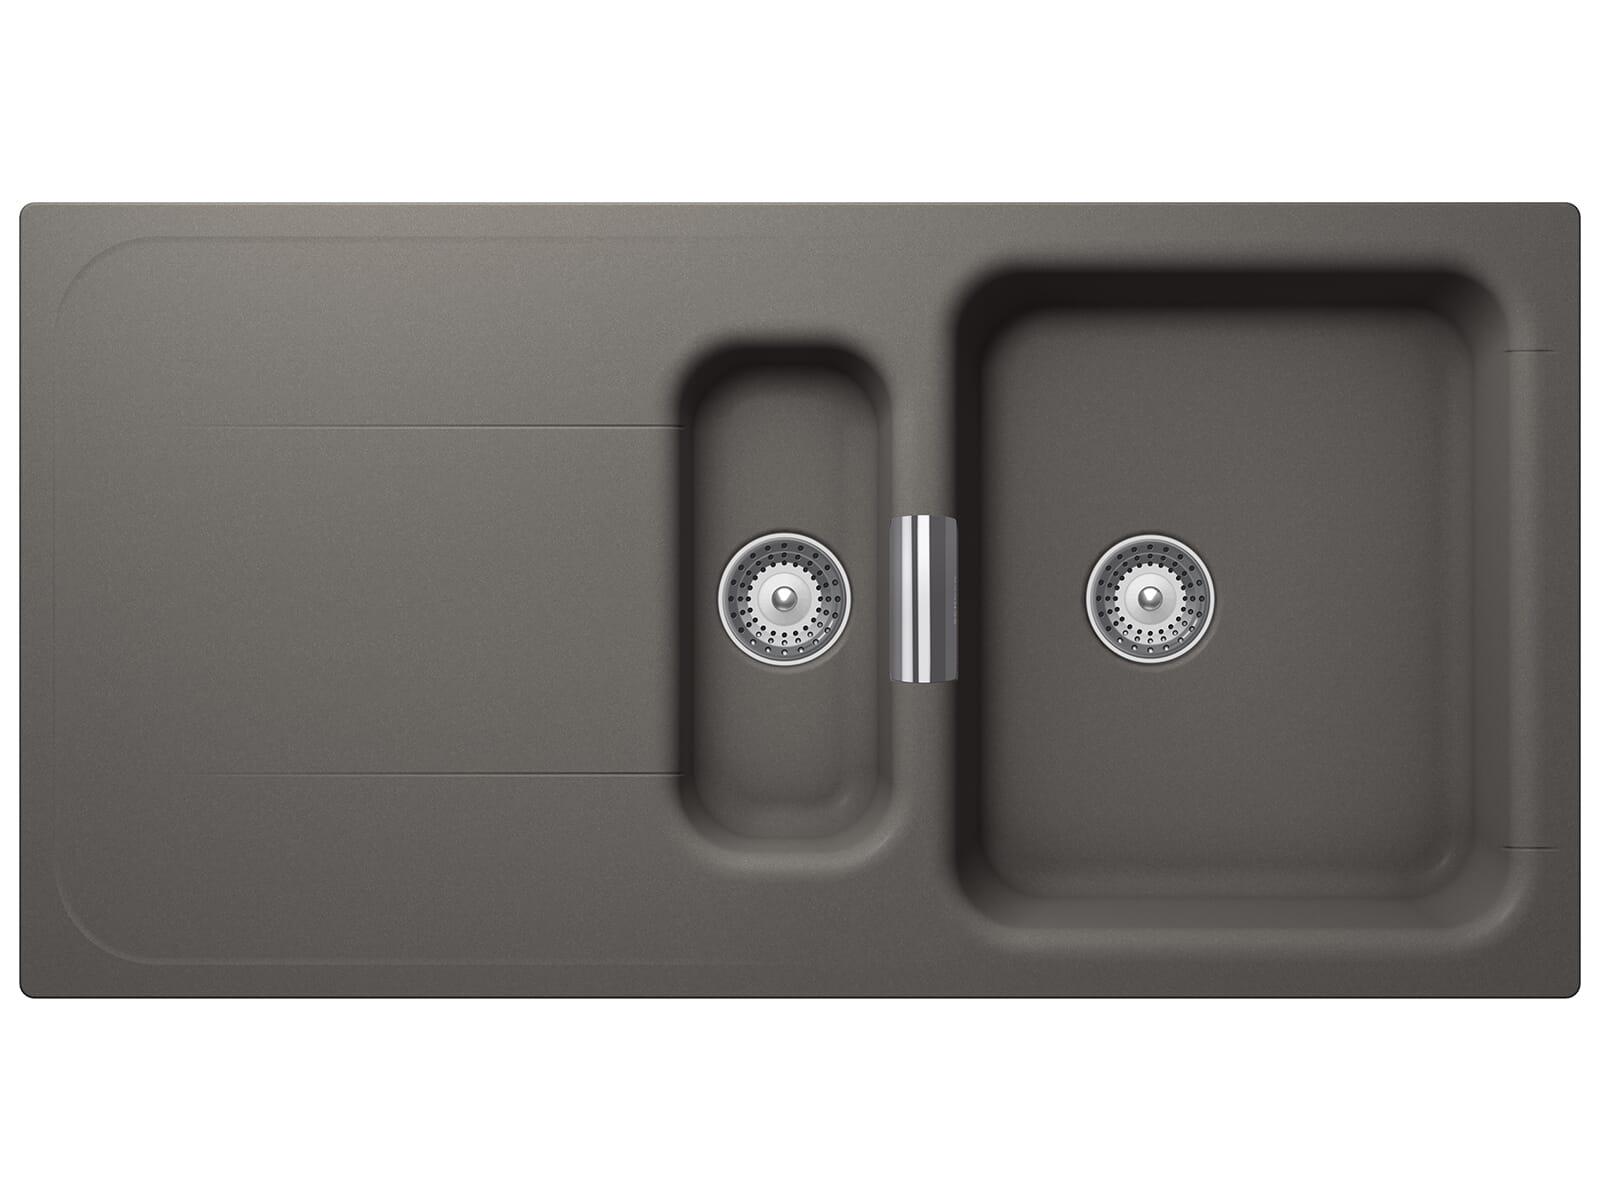 Schock Wembley D-150 A Silverstone - WEMD150ASIL Granitspüle